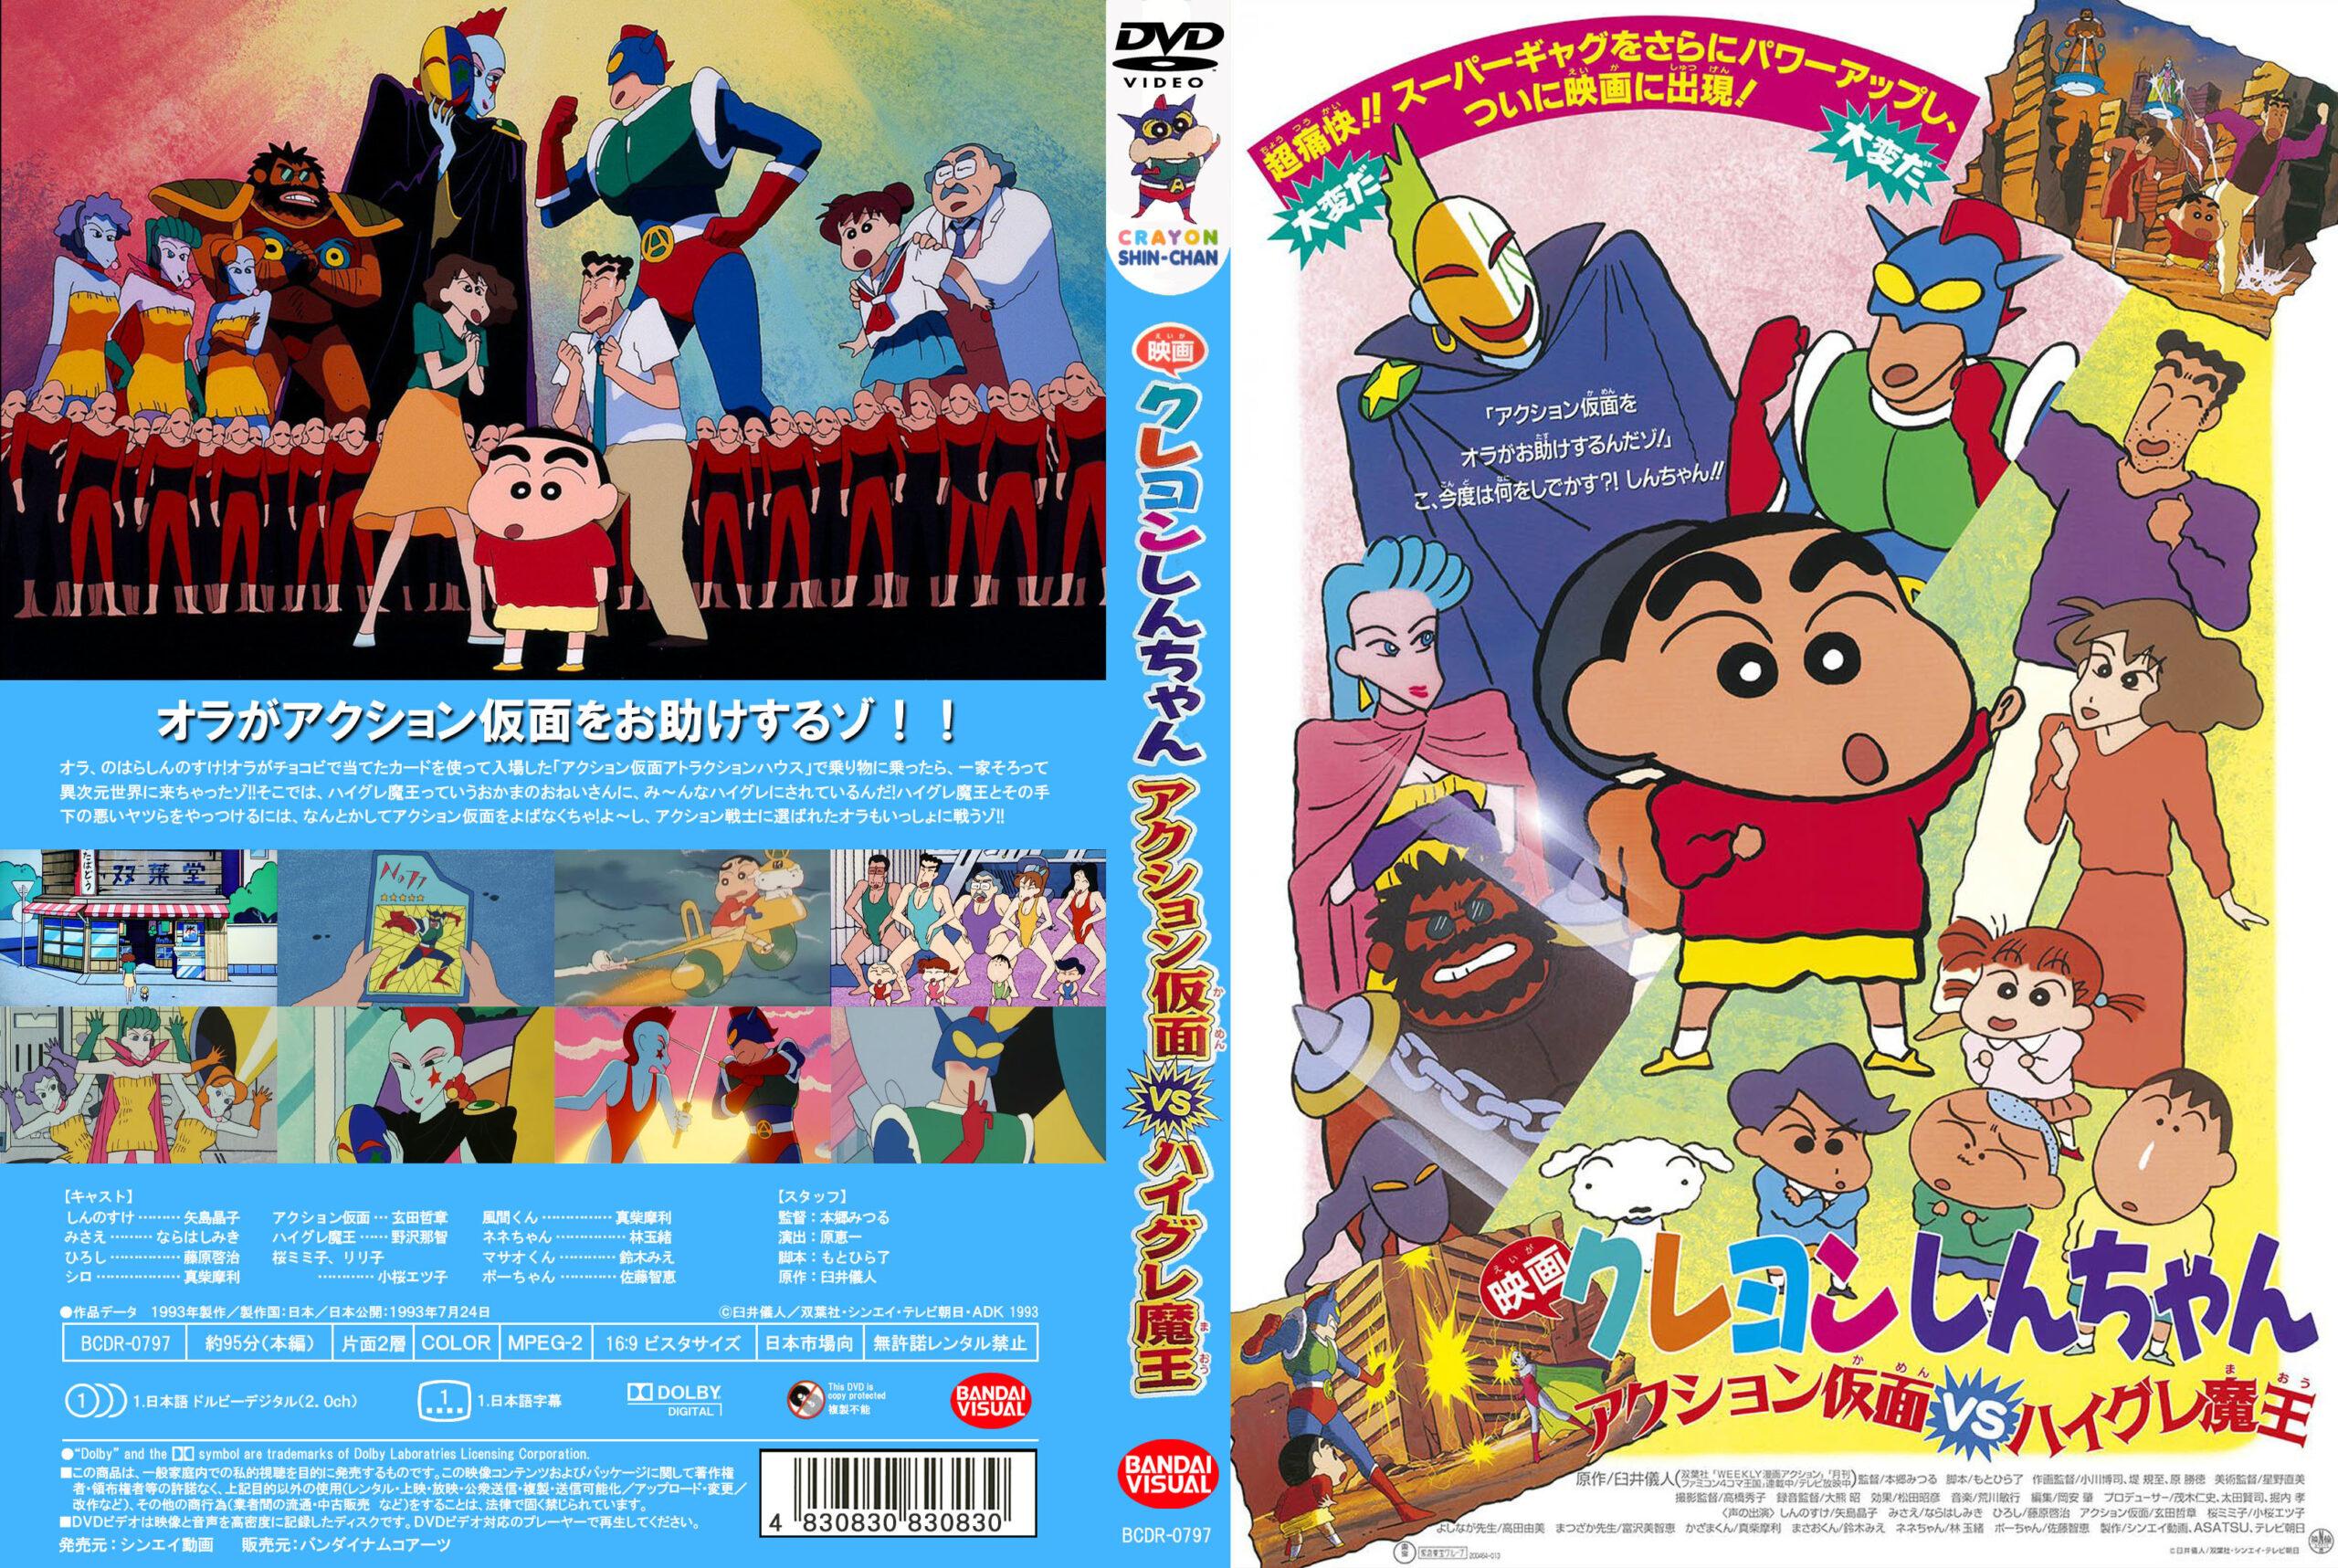 Crayon Shin-chan Movie 01: Action Kamen vs. Haigure Maou (1993) Full Movie in Tamil 1080p WEB-DL